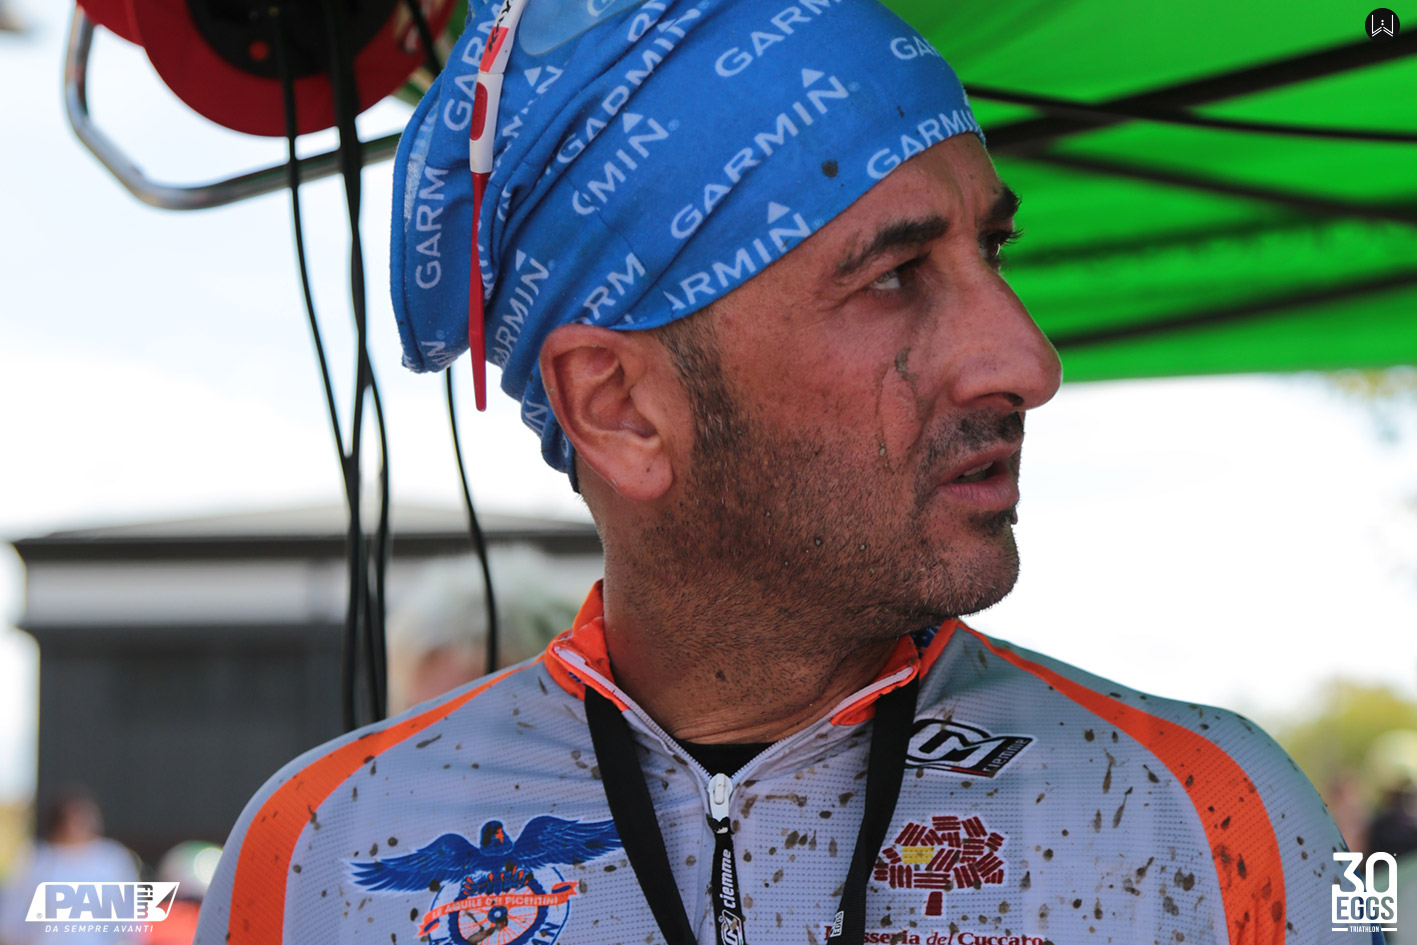 Vittoria sofferta - 30EGGS Triathlon Cross Super Sprint